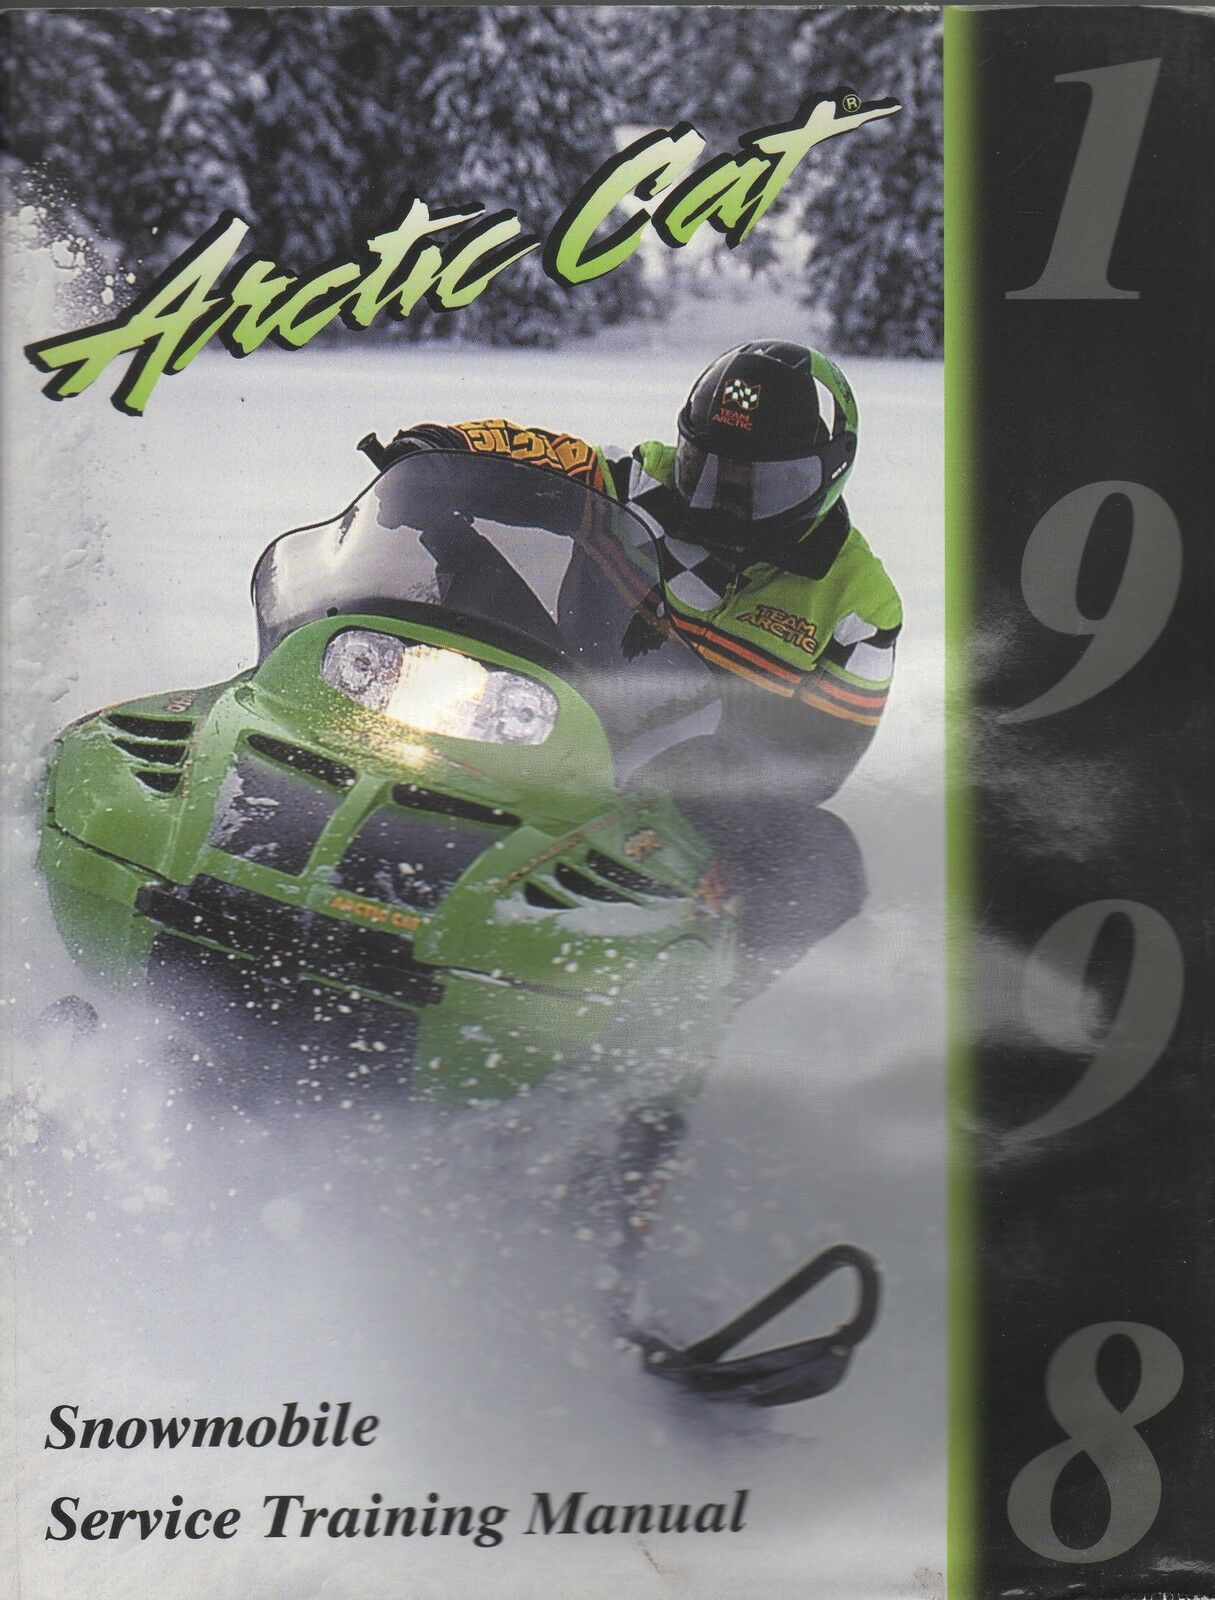 1998 ARCTIC CAT SNOWMOBILE SERVICE TRAINING  MANUAL